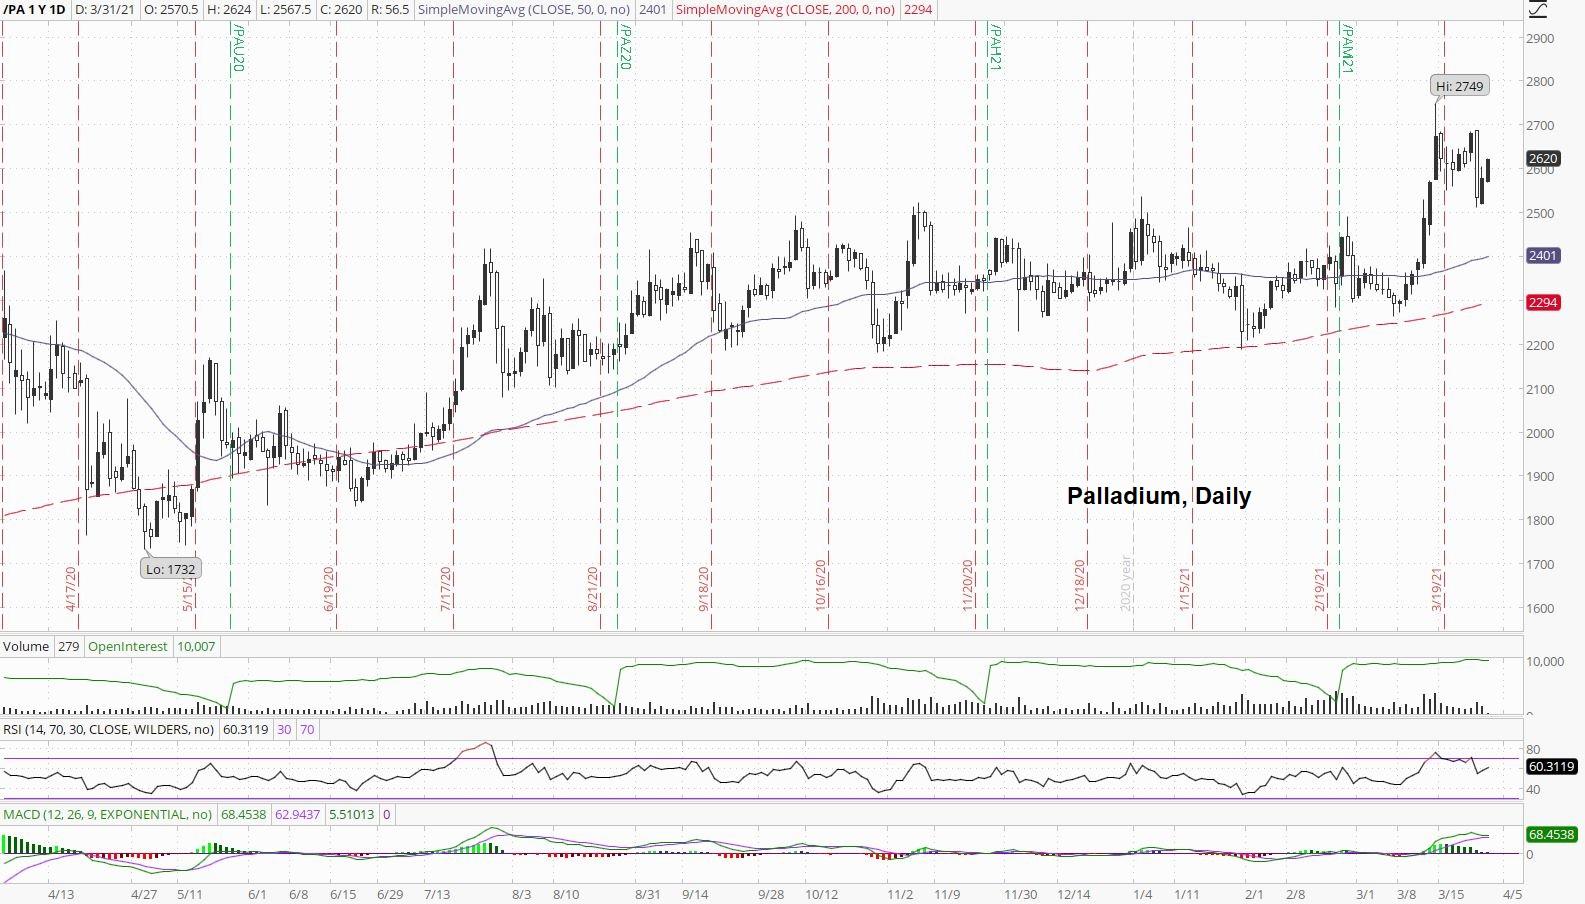 Daily Palladium Price